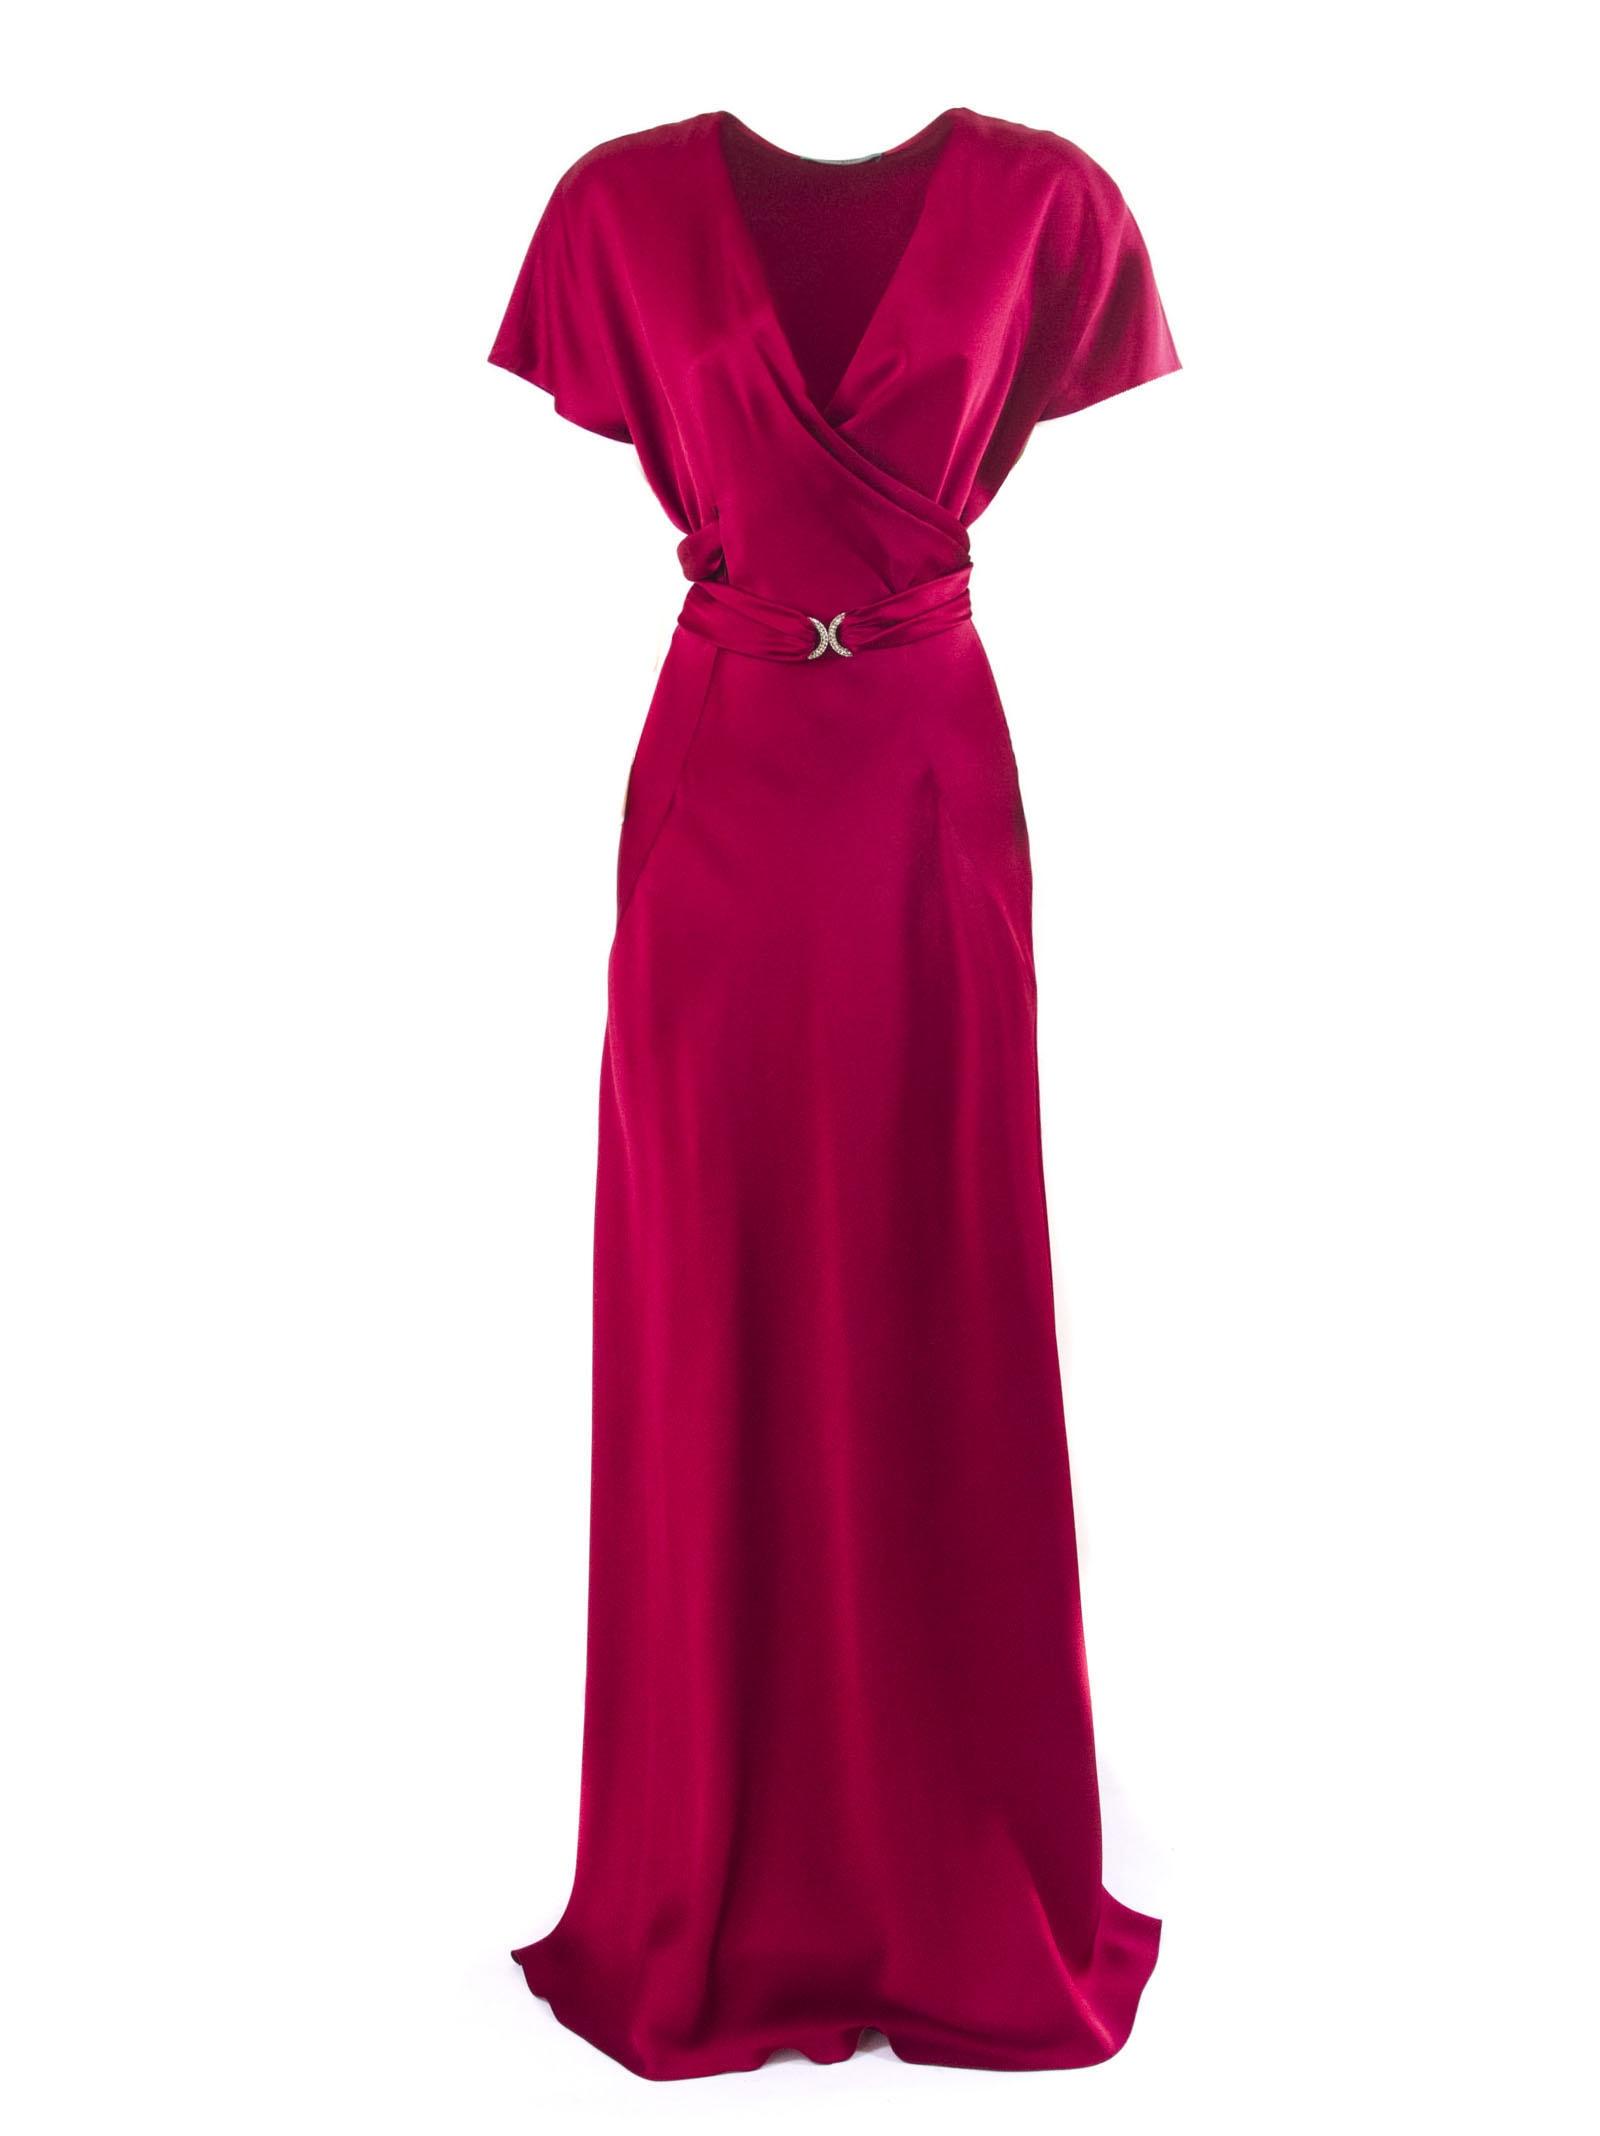 Alberta Ferretti Dress In Red Enver Satin